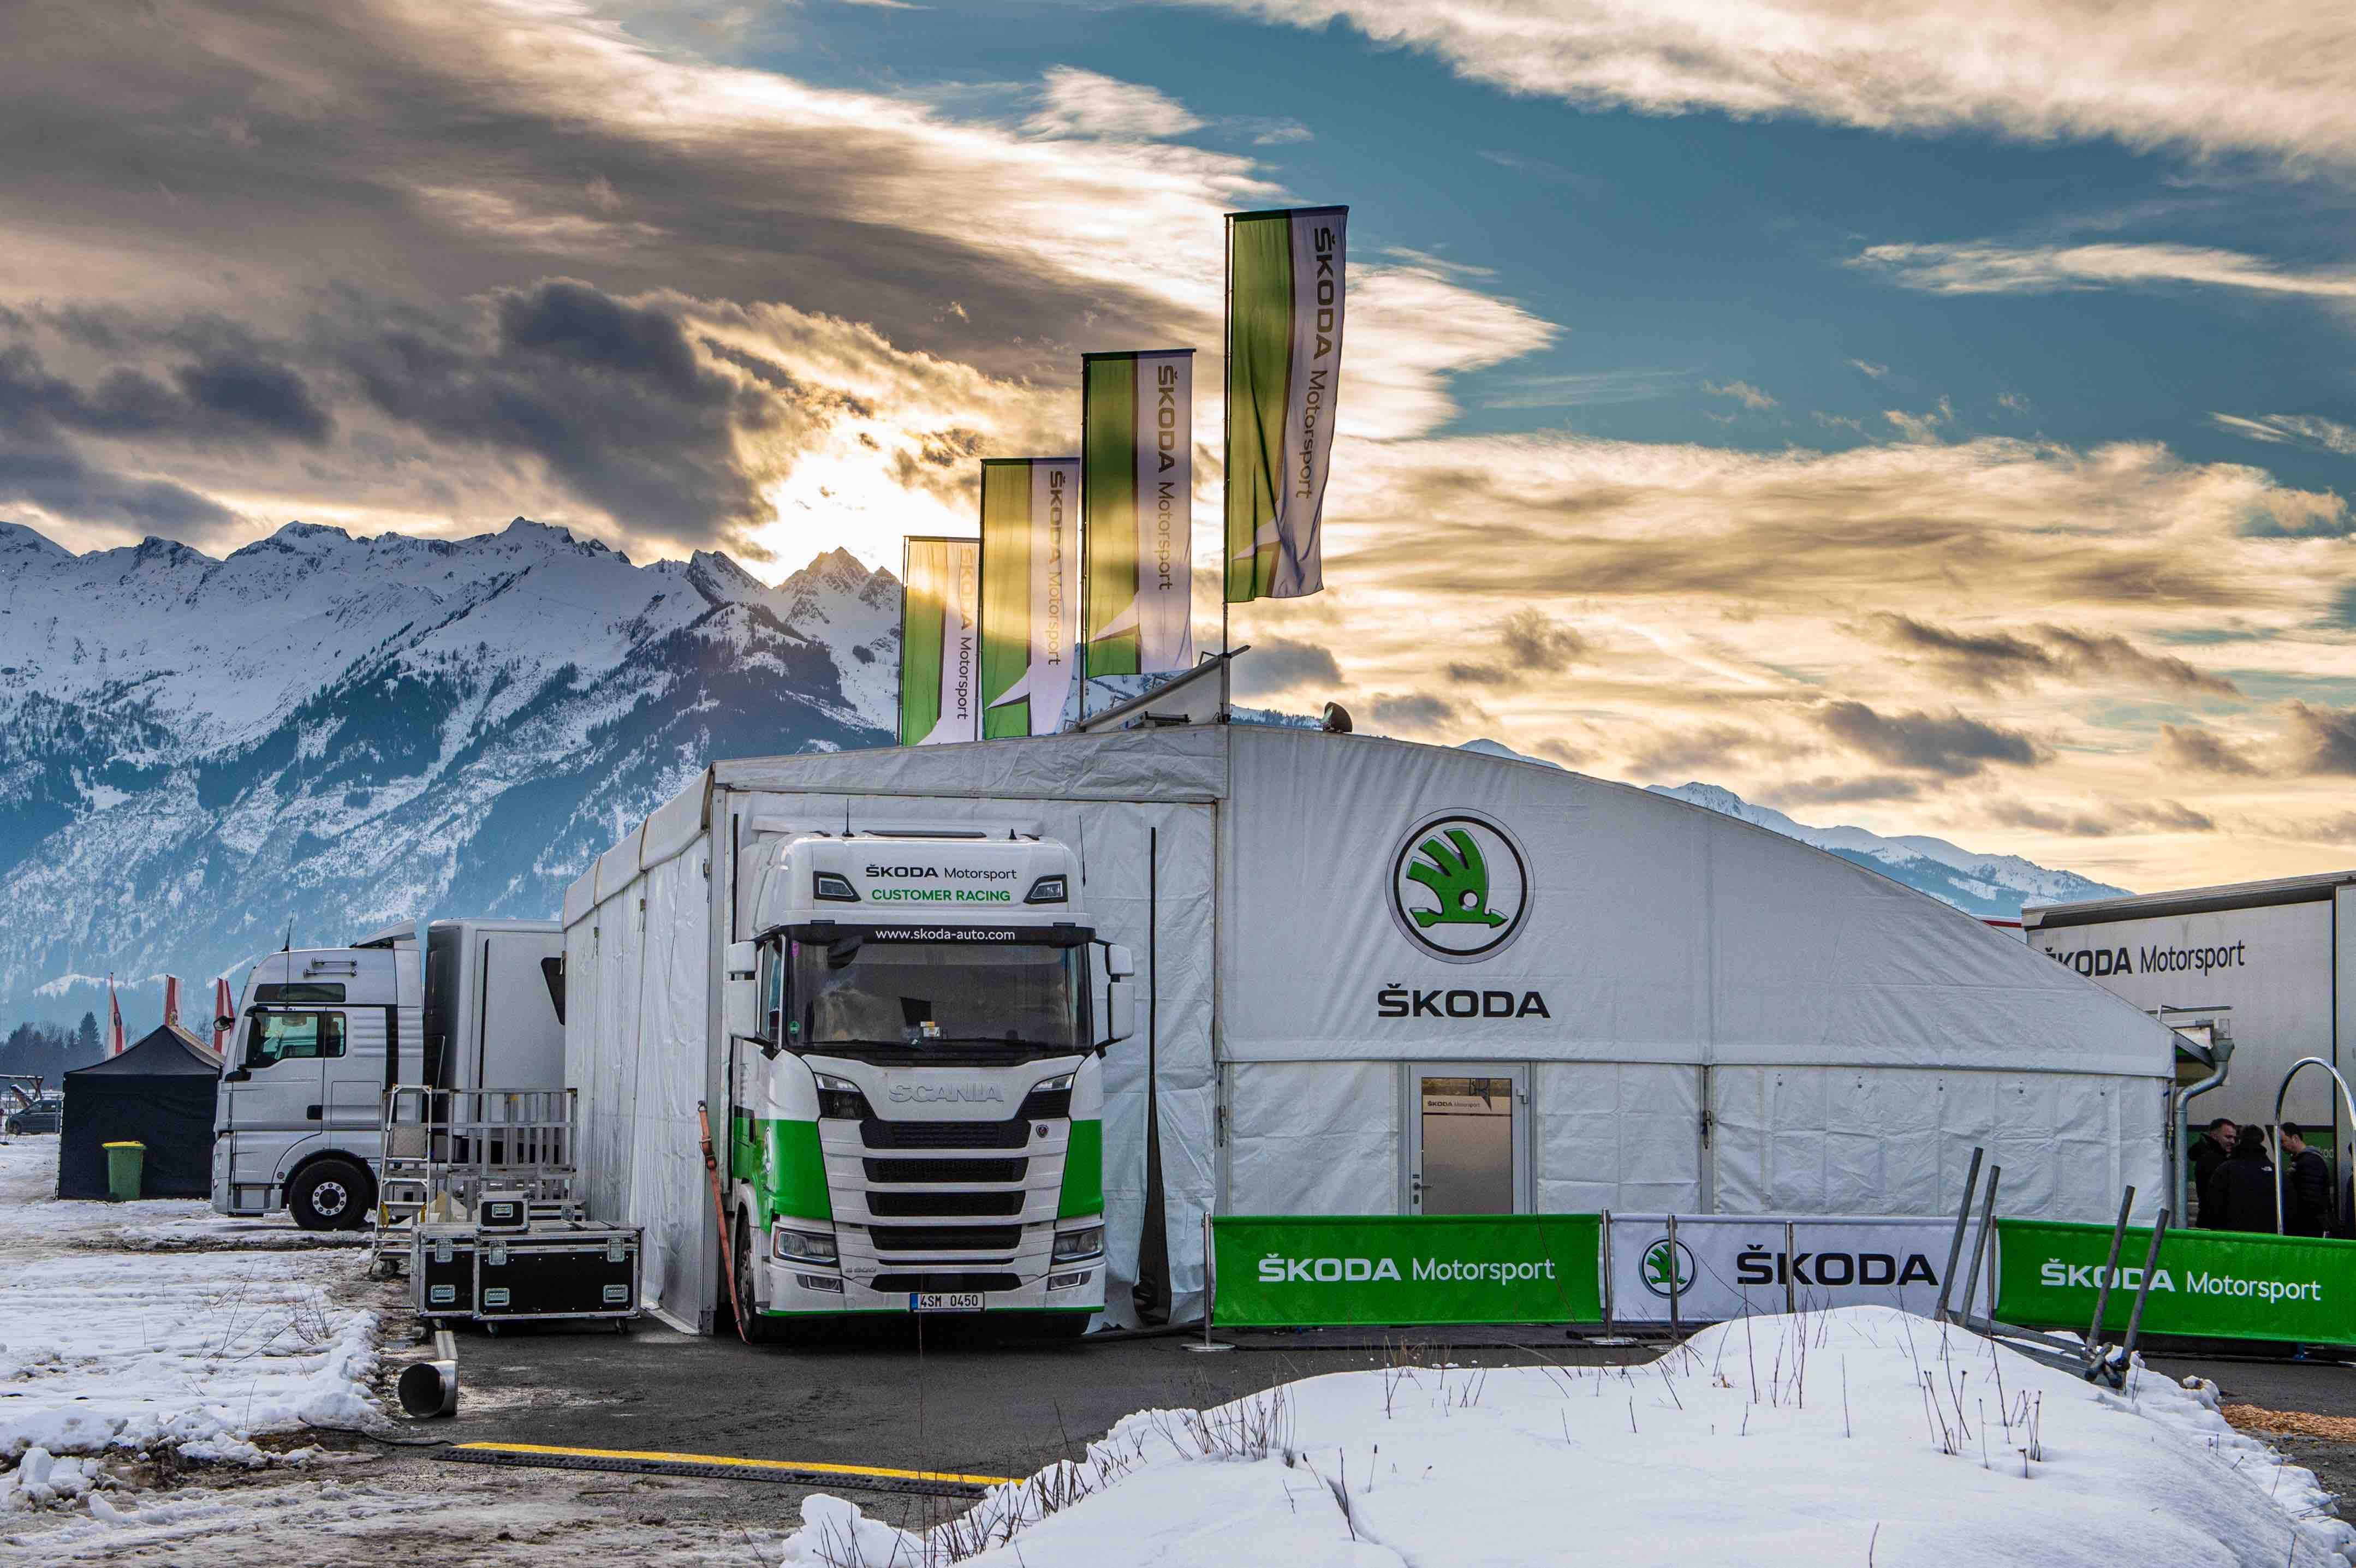 SKODA Motorsport customer racing: From Mladá Boleslav to rallies around the world - Image 1